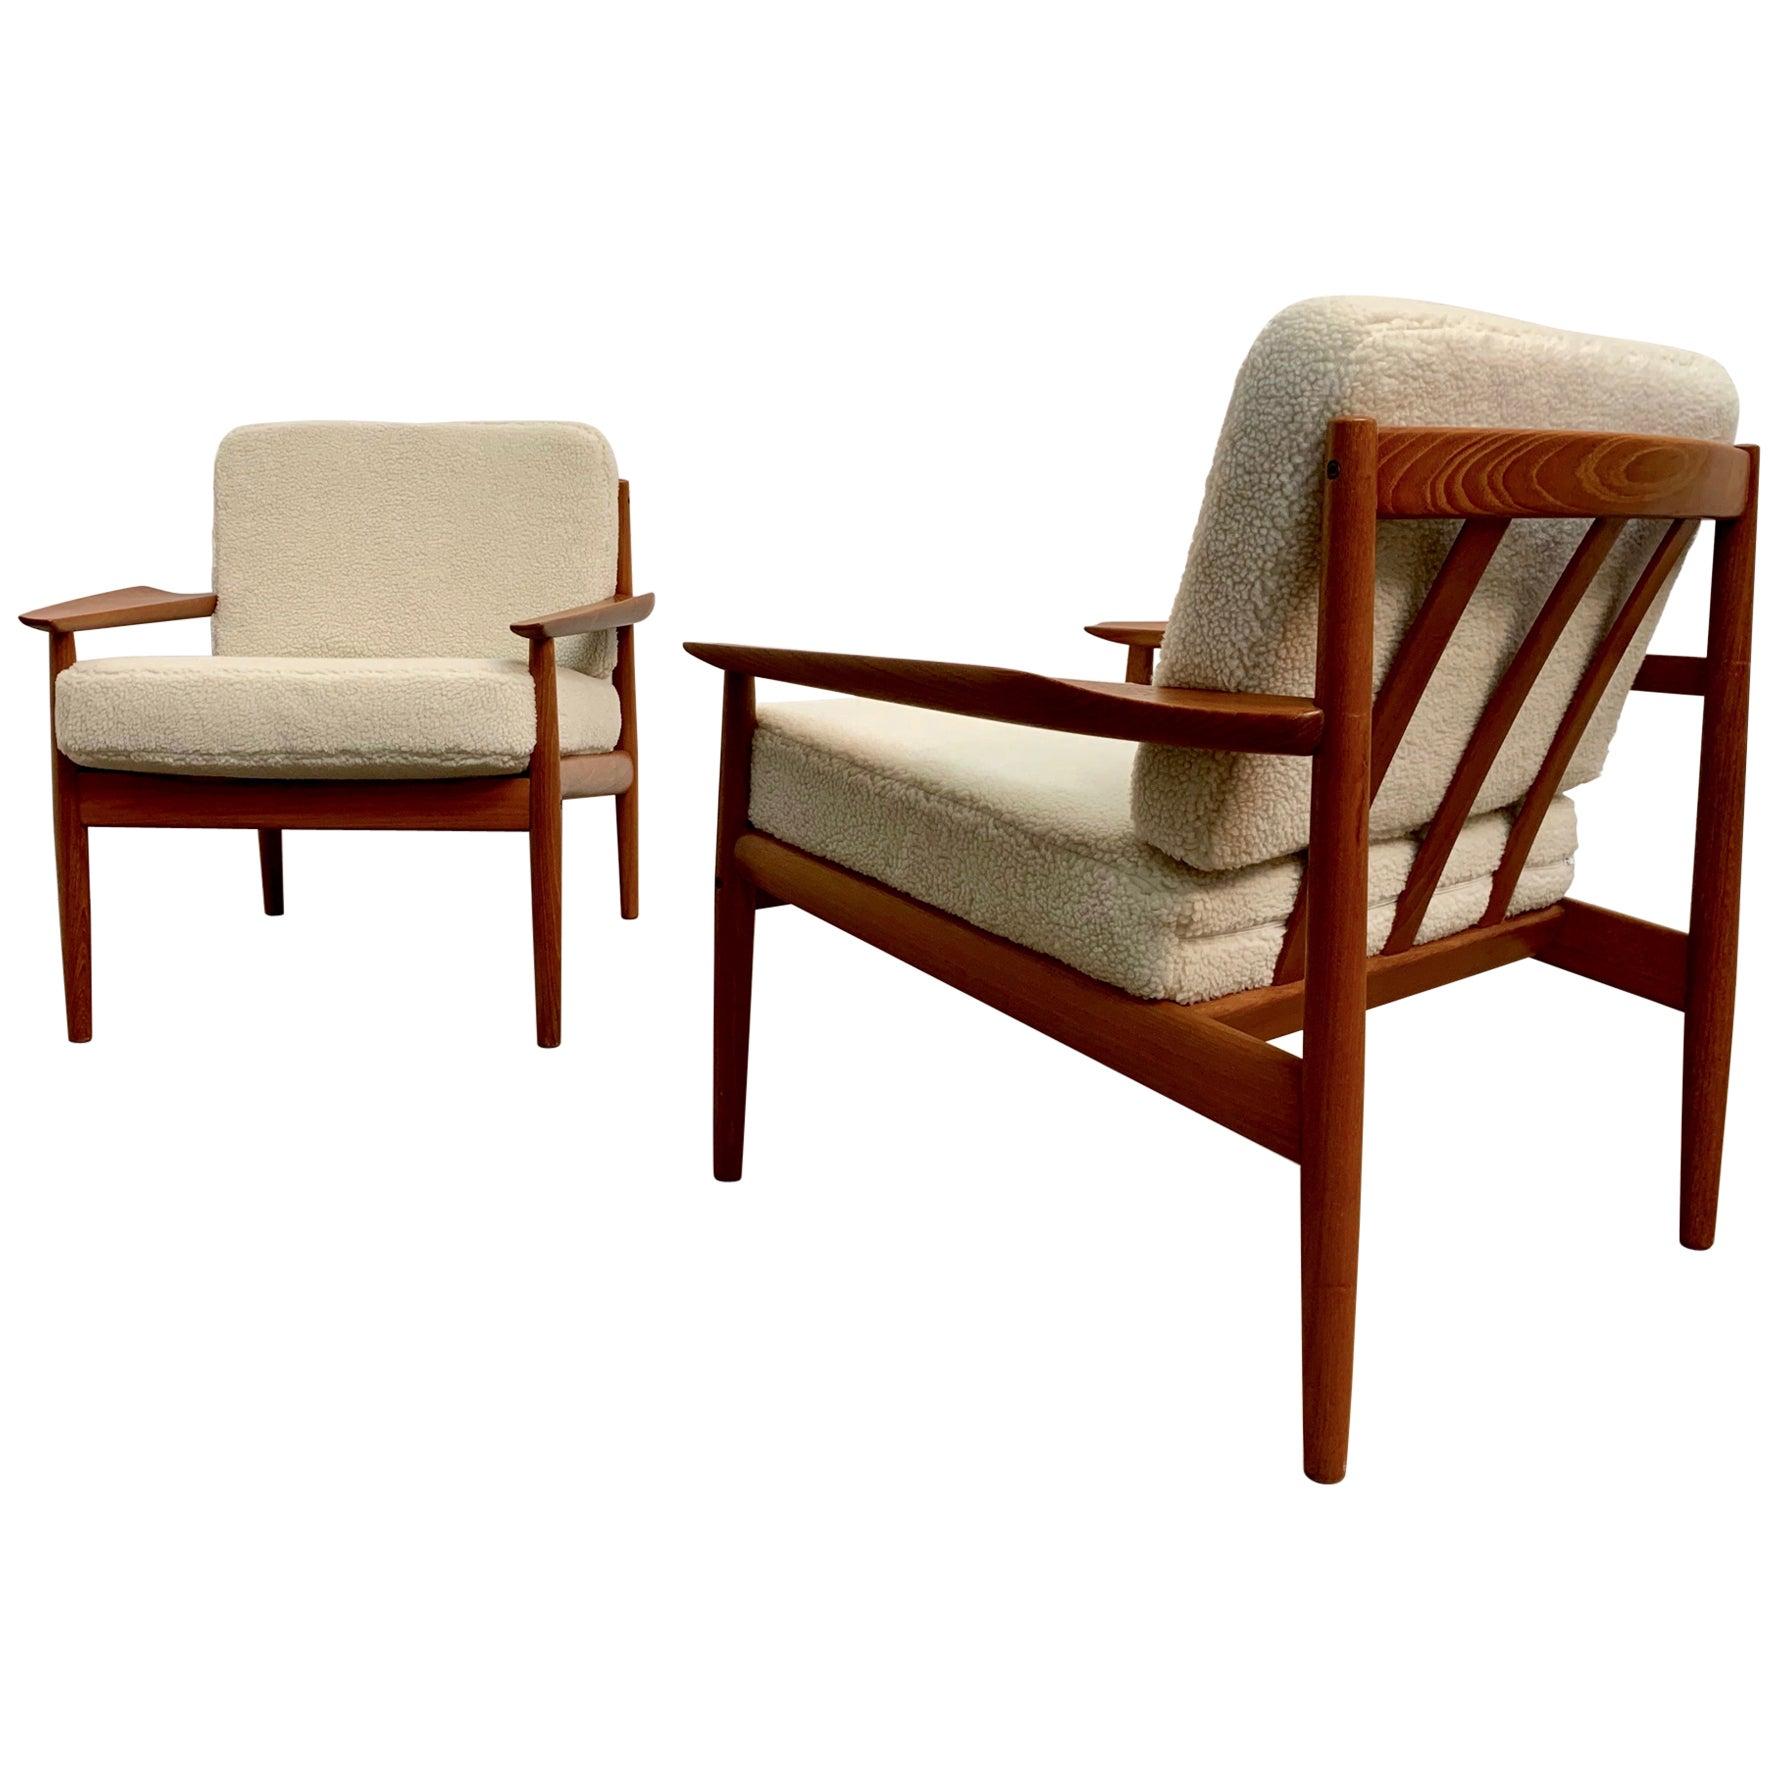 Danish Modern Lounge Chairs by Arne Vodder in Teddy Faux Fur